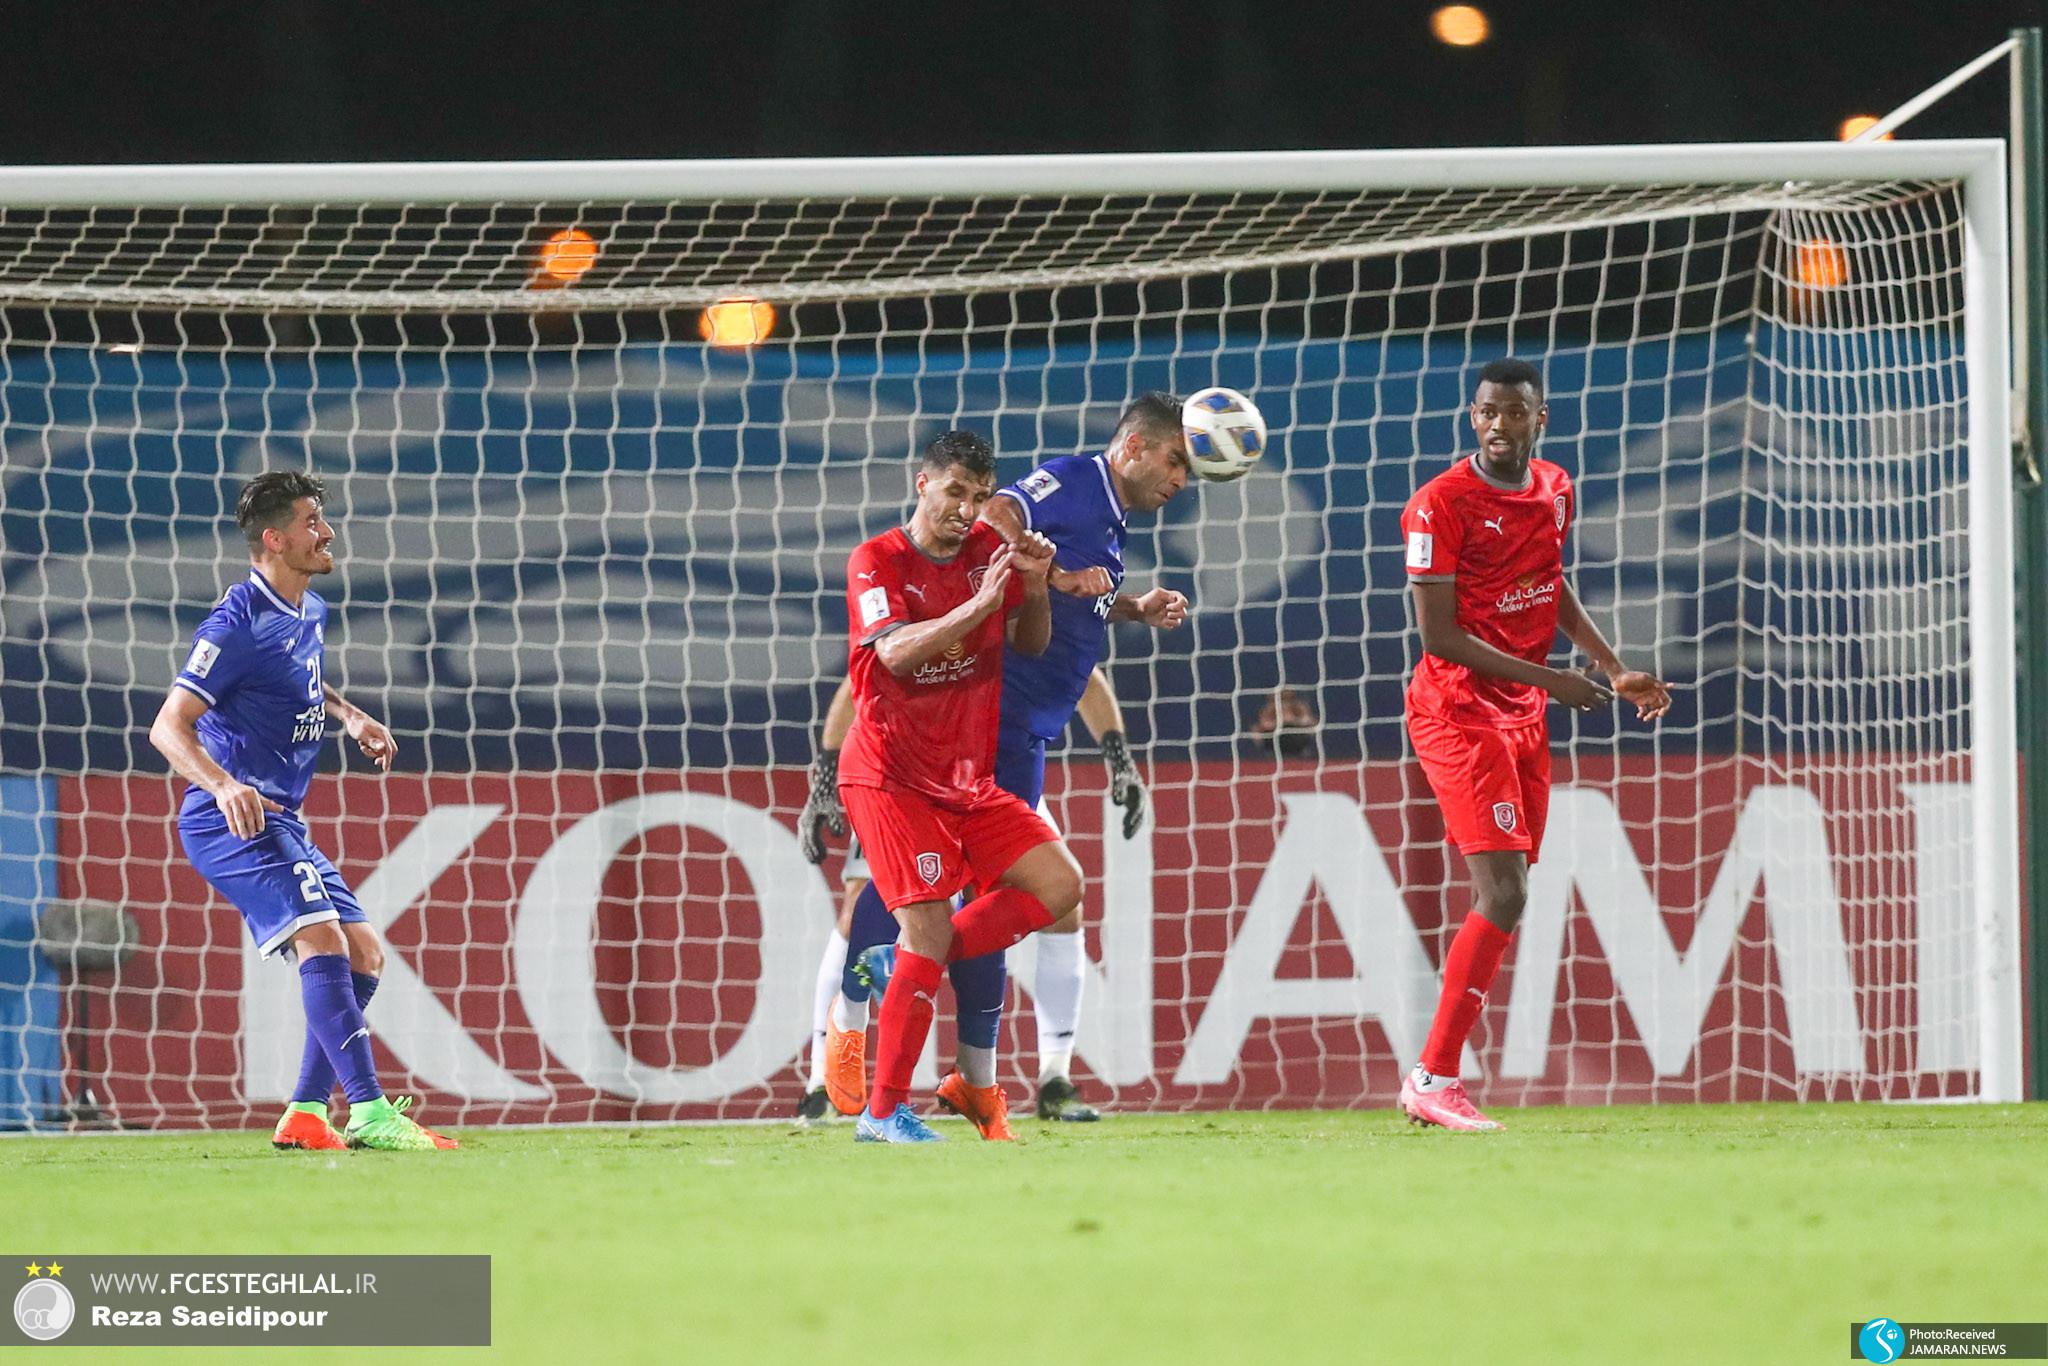 لیگ قهرمانان آسیا استقلال الدحیل قطر